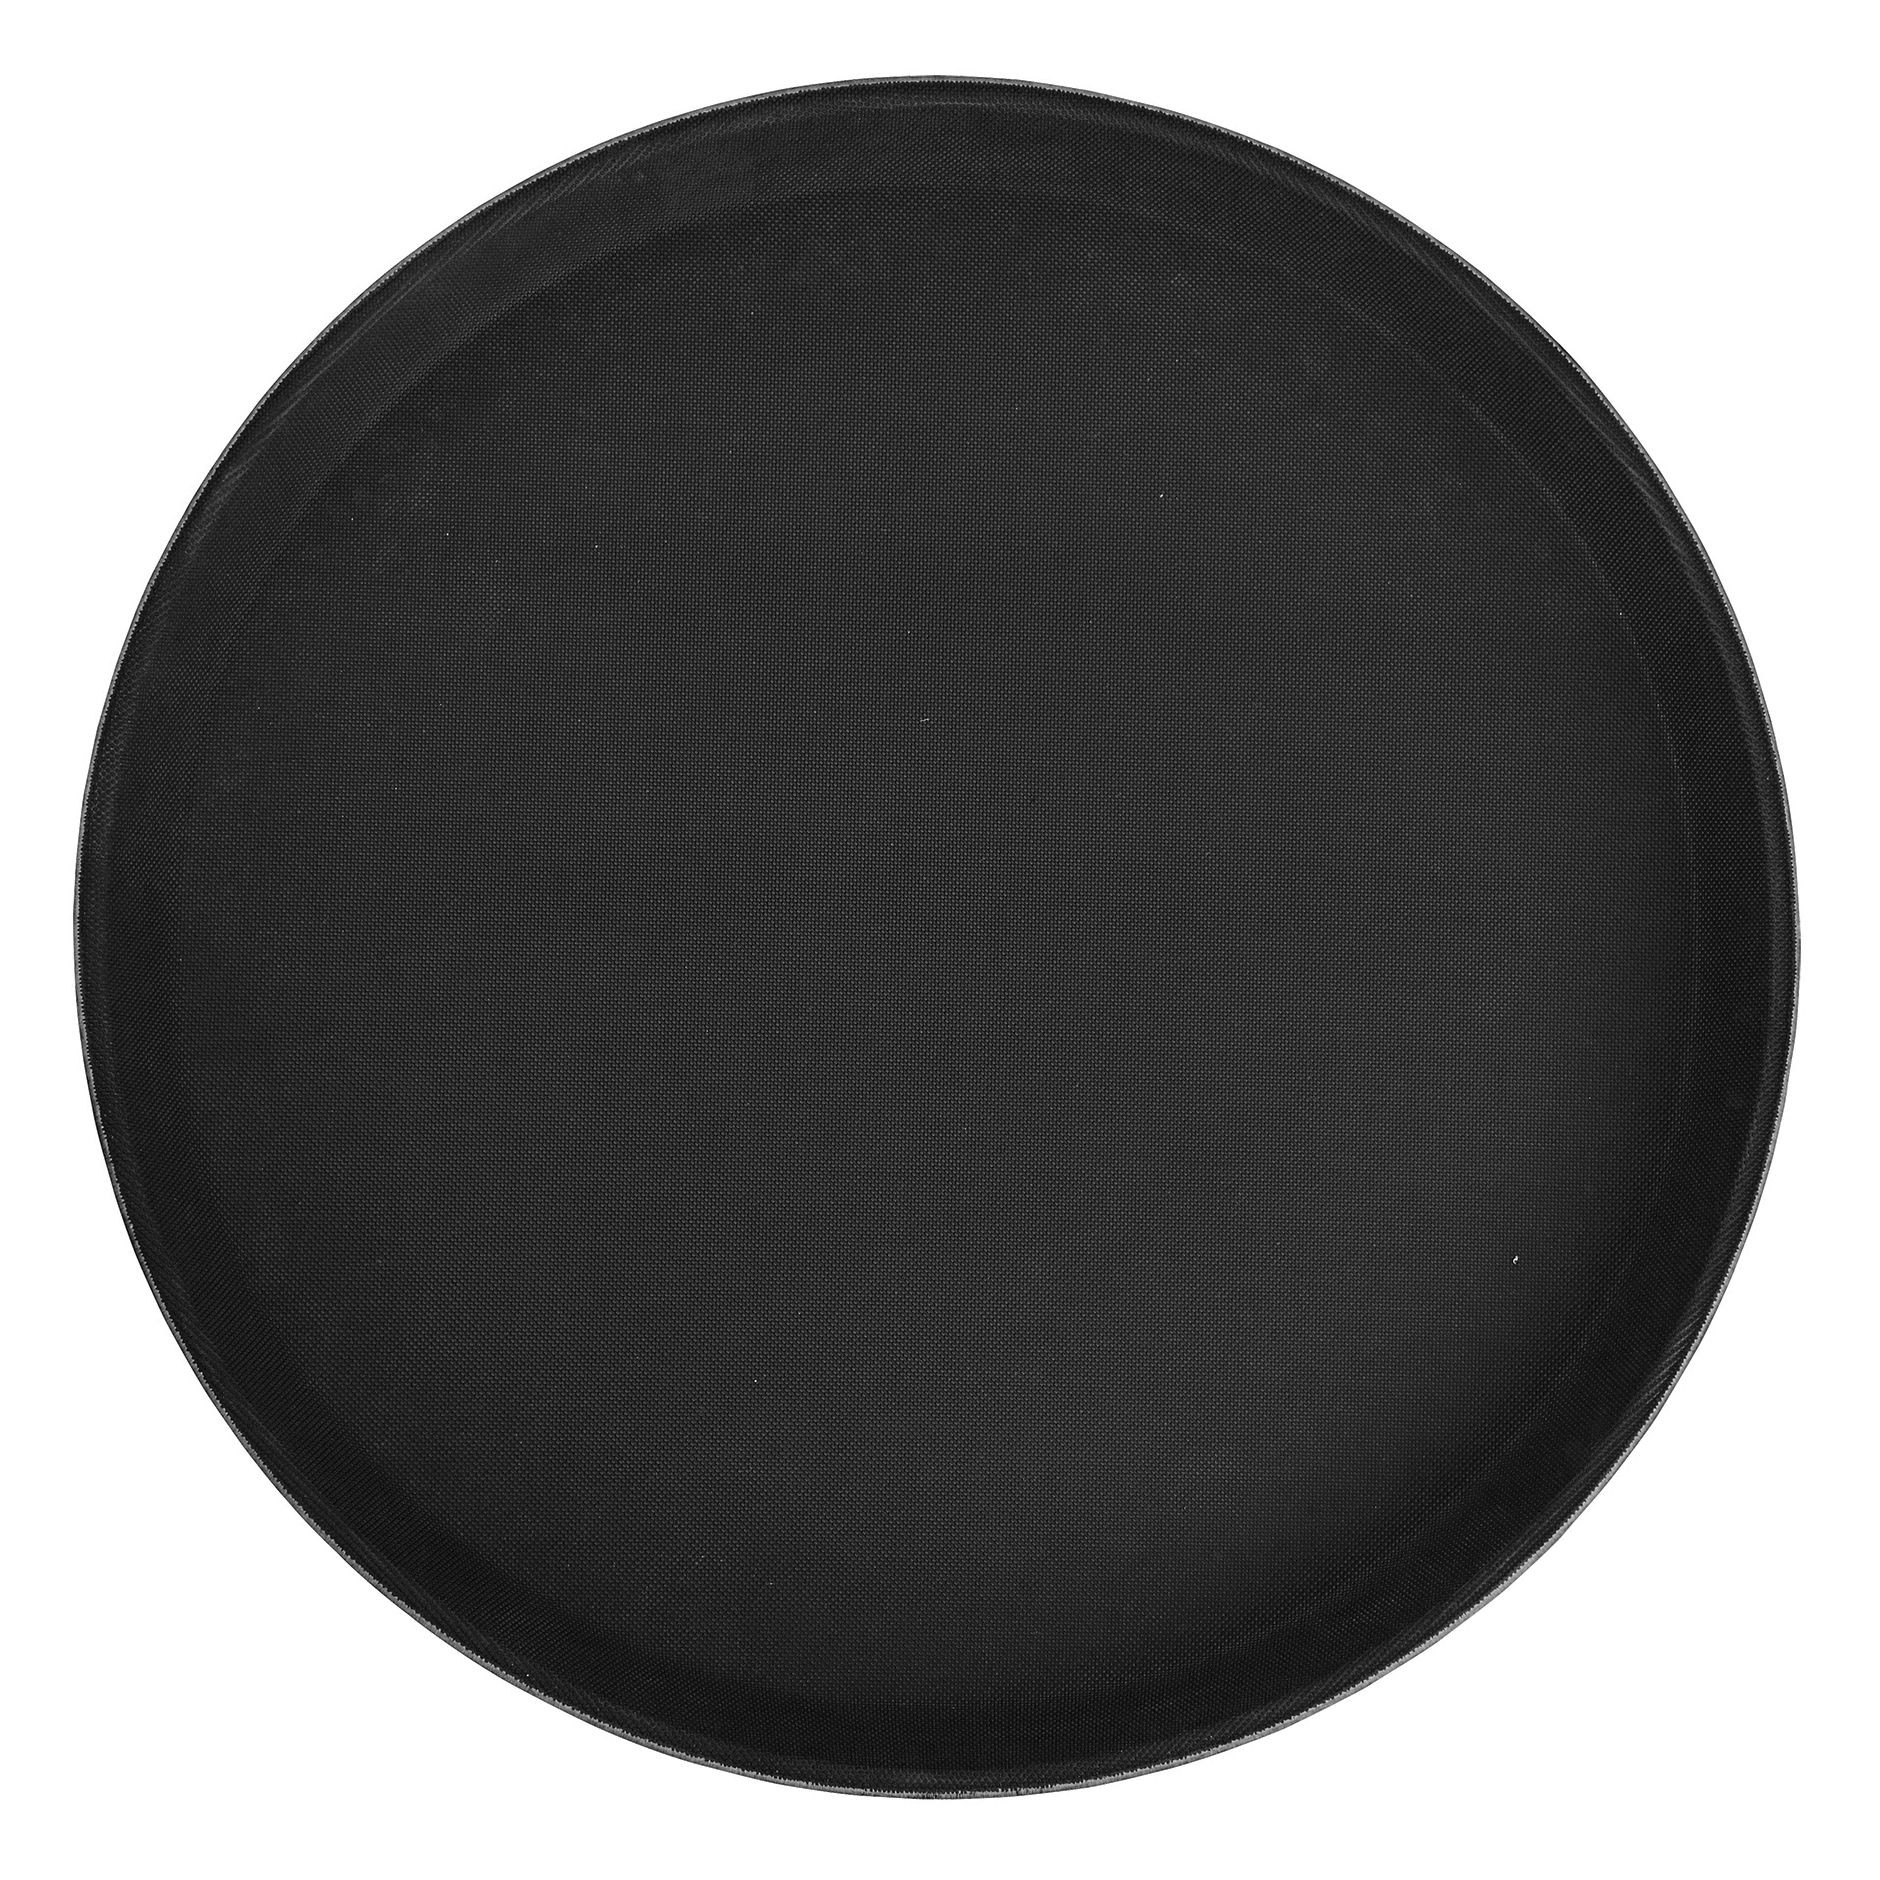 "Winco TFG-14K Black Round Non-Slip Fiberglass Tray, 14"""